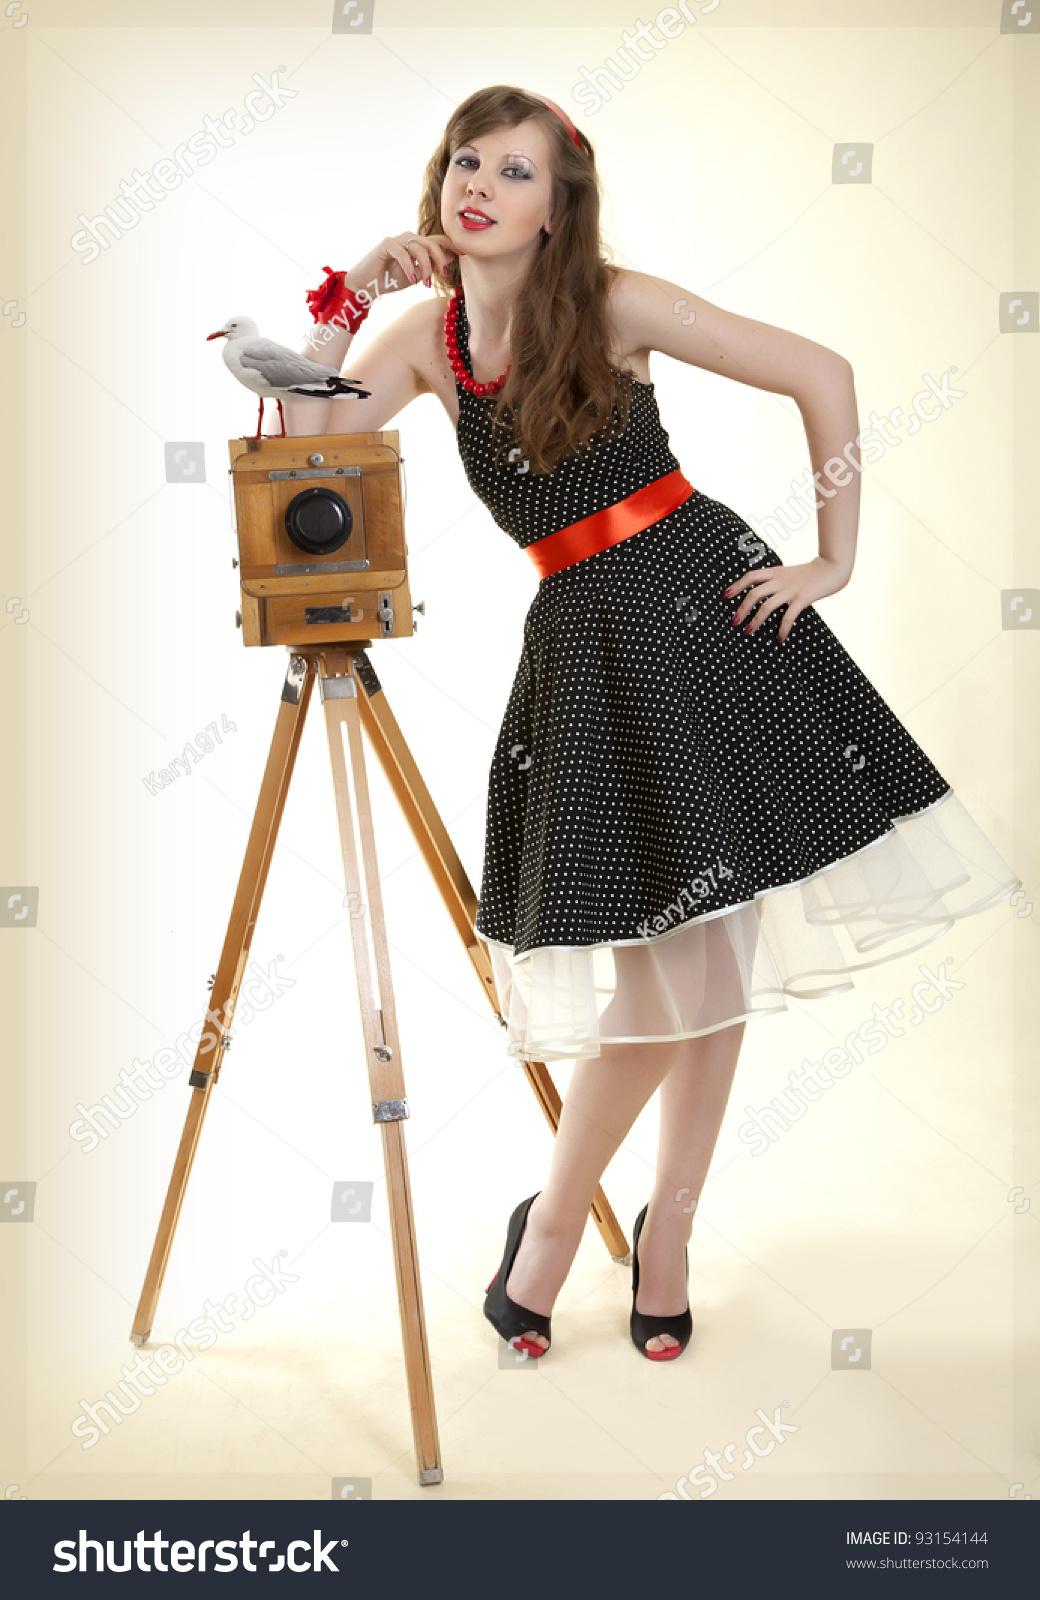 Pin-Up Girl And Vintage Camera Stock Photo 93154144 ...